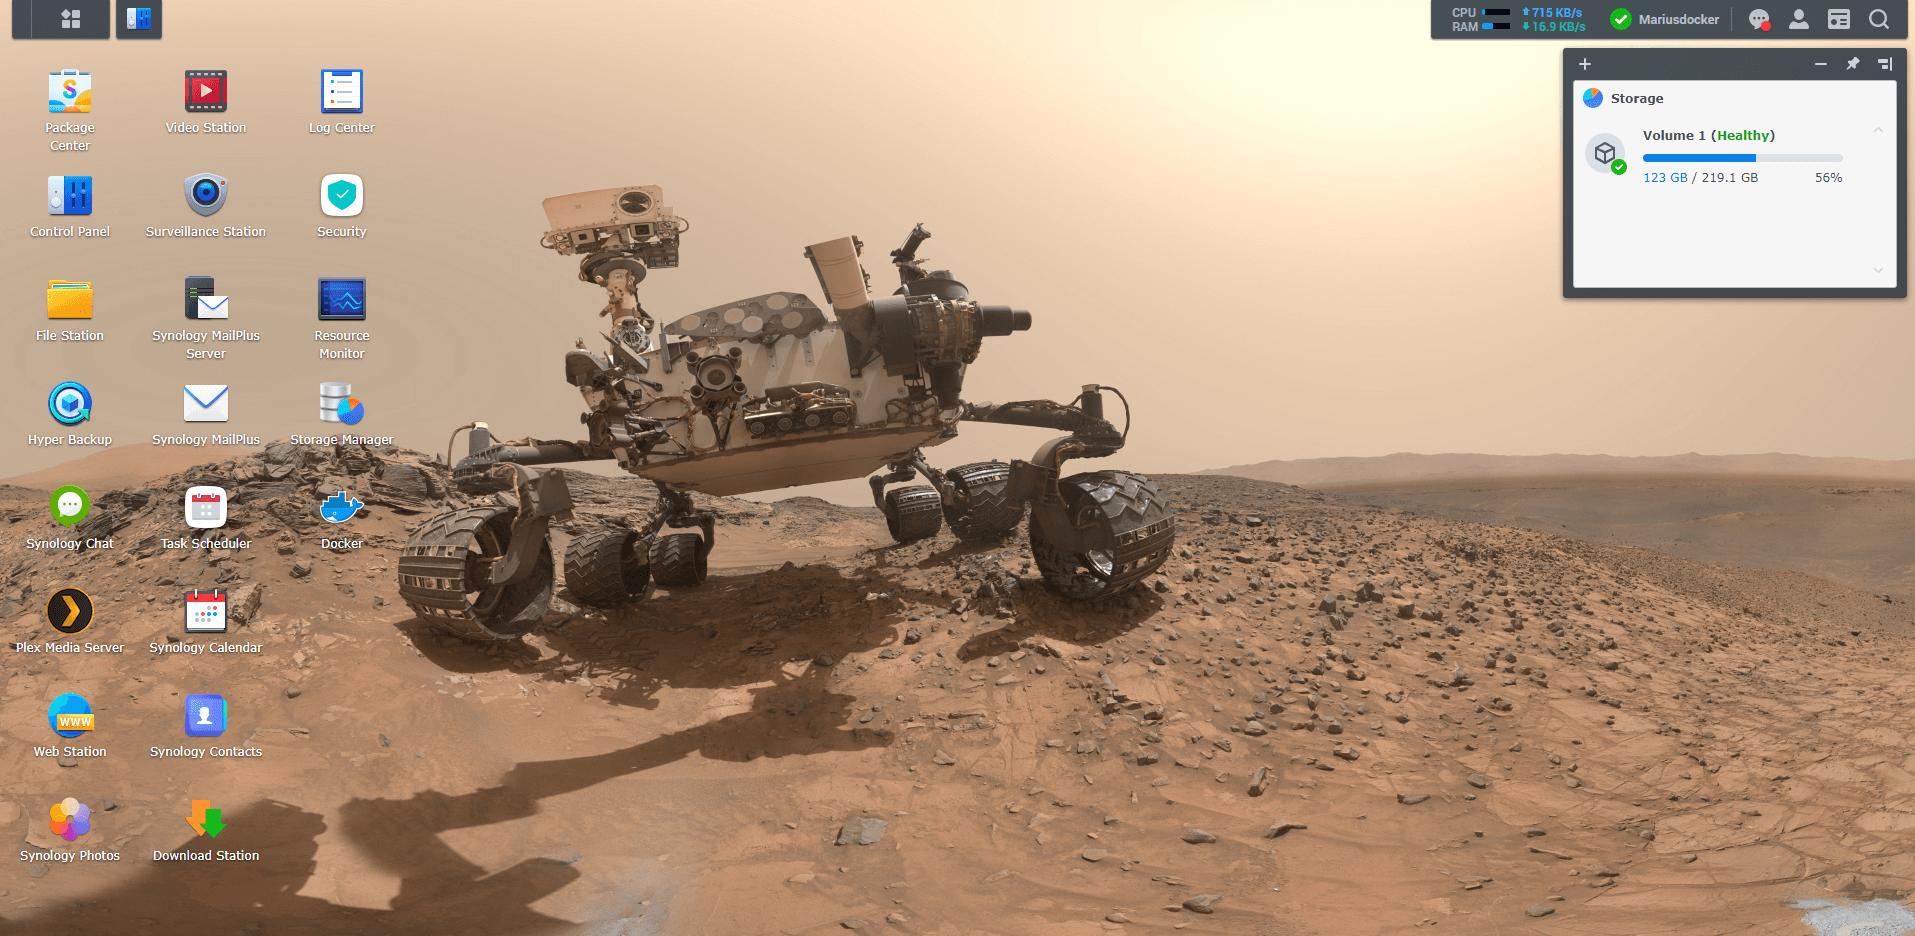 Synology NAS Mars Wallpaper 3